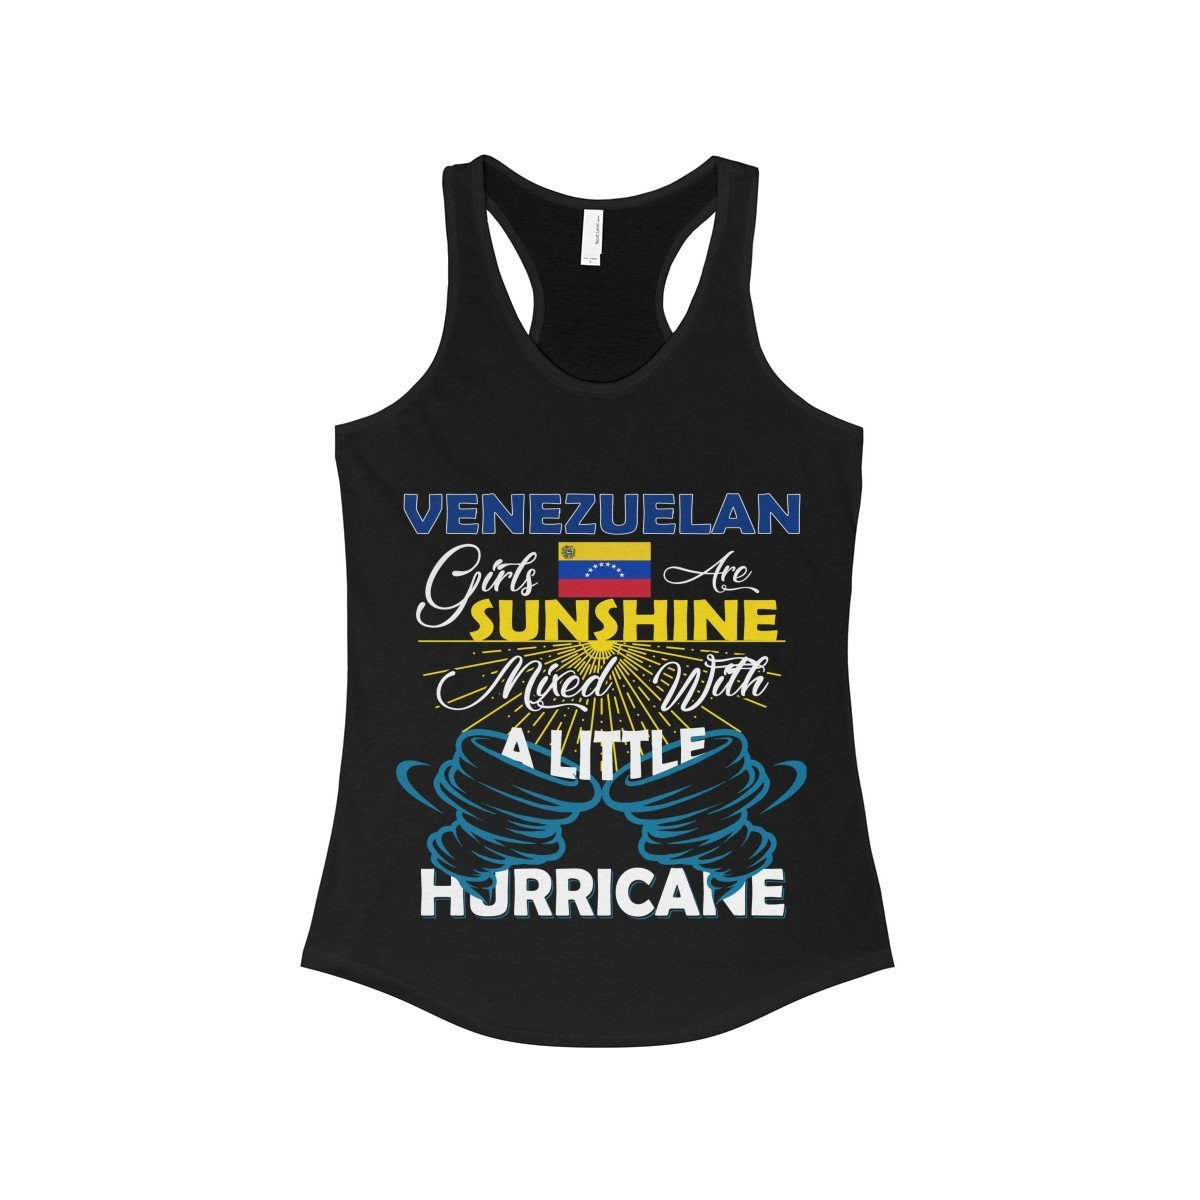 FavoryStore Venezuelan Girls Are Sunshine Mixed With a Little Hurricane Shirt Tank Top